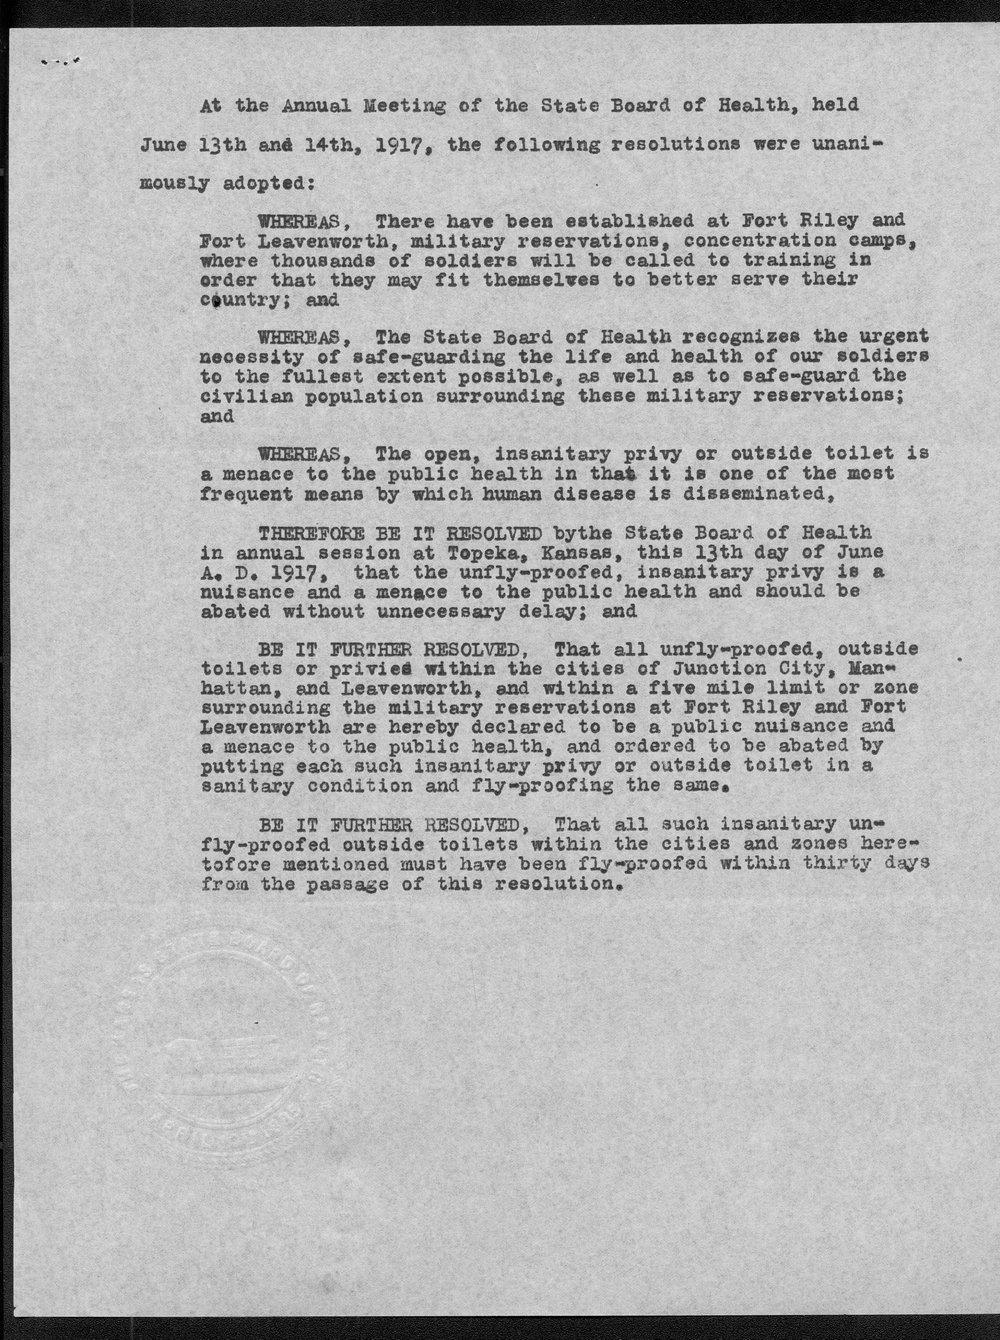 Samuel Crumbine to Governor Arthur Capper - 3